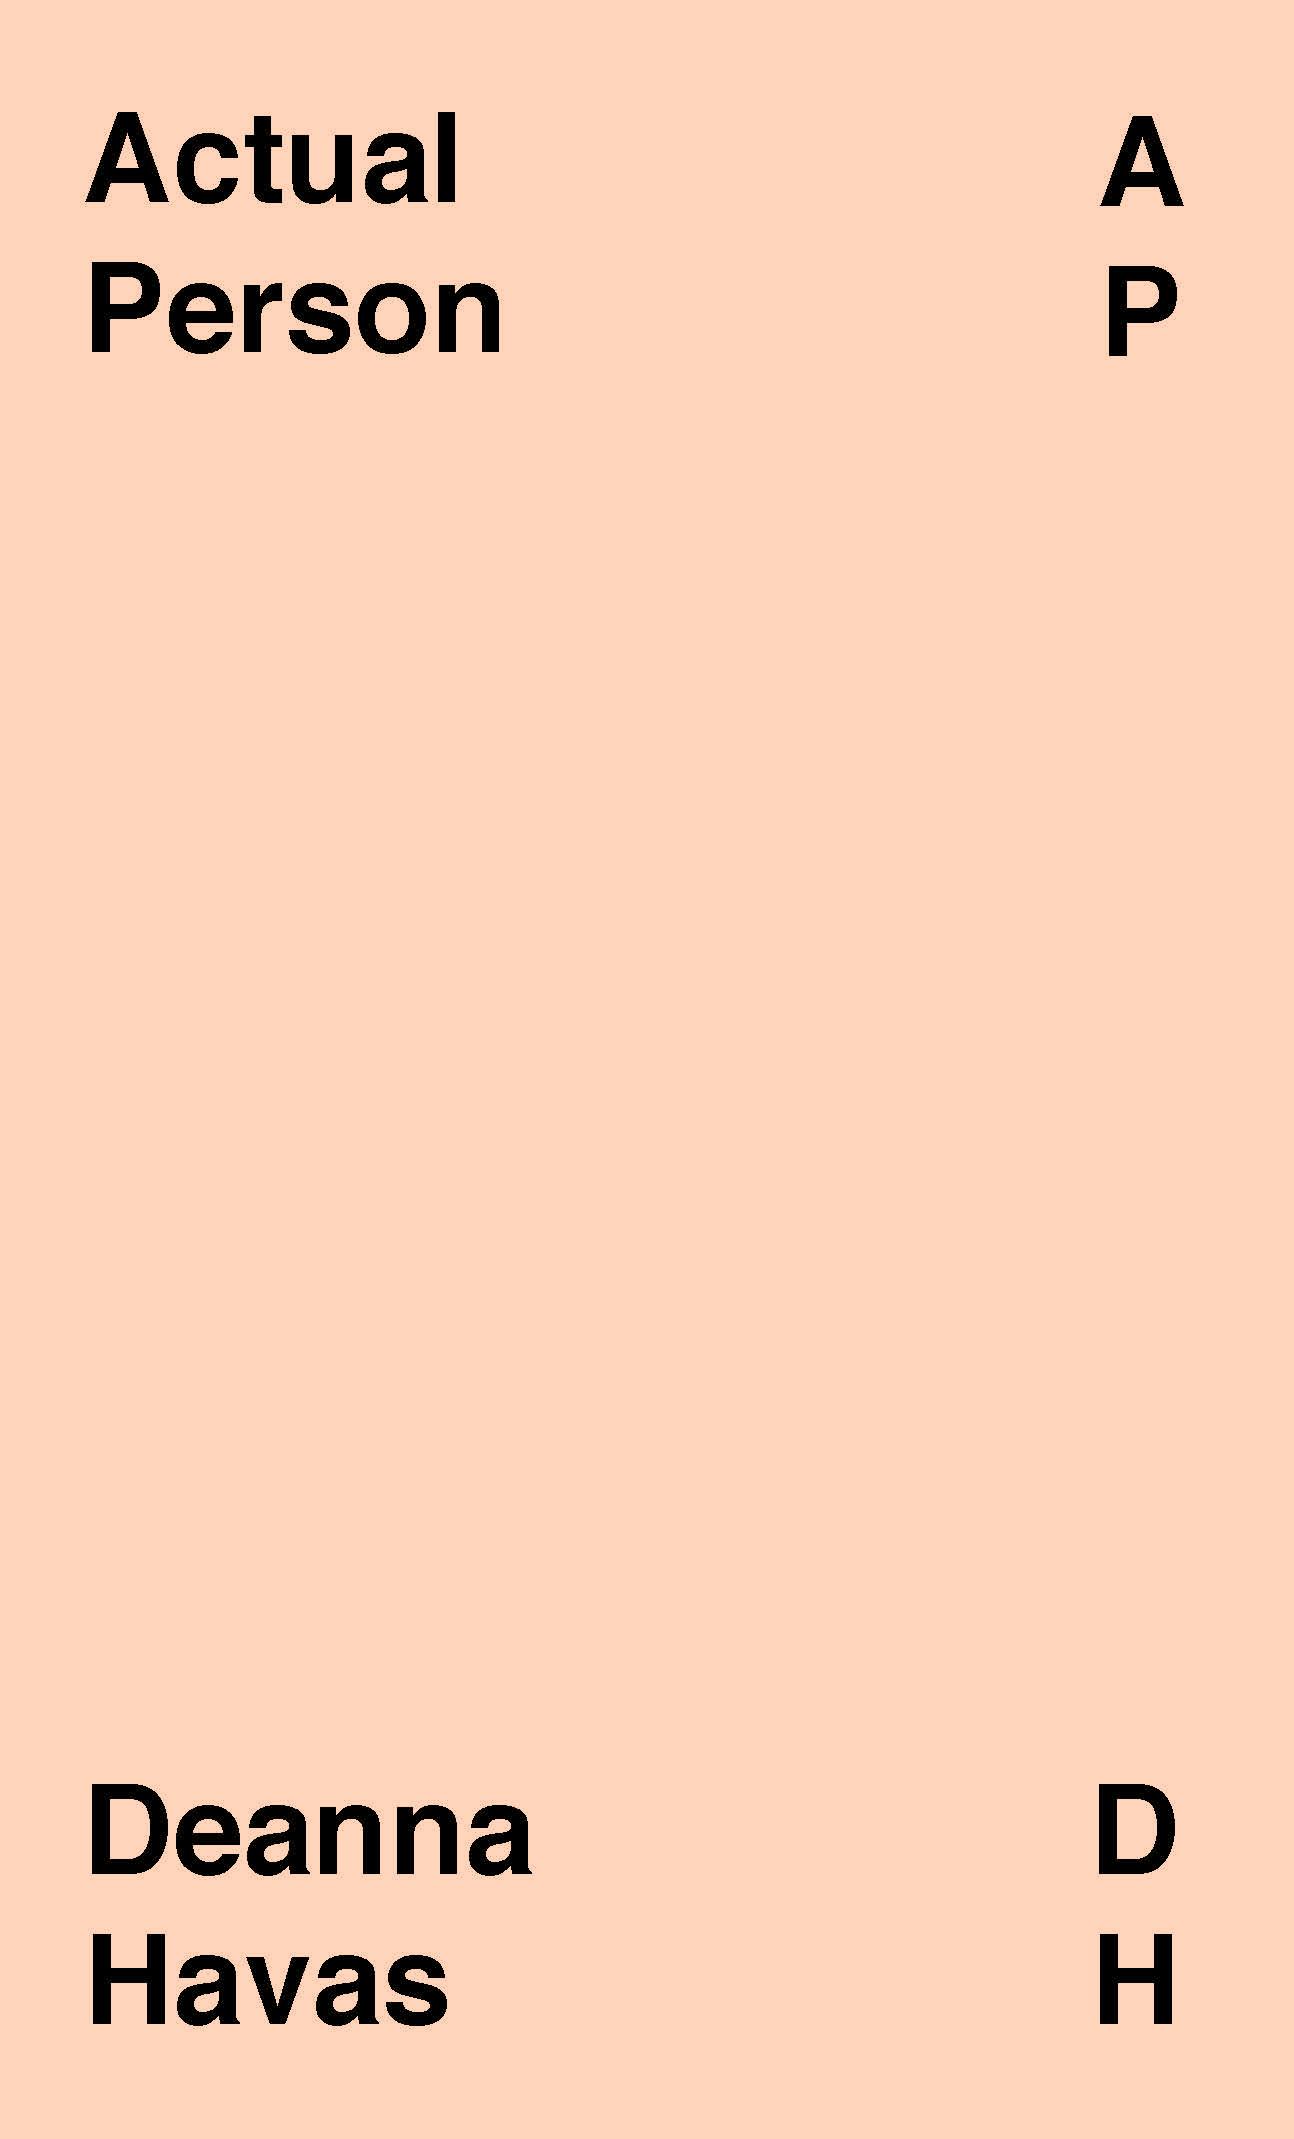 0107-Havas-ActualPerson-frontcover